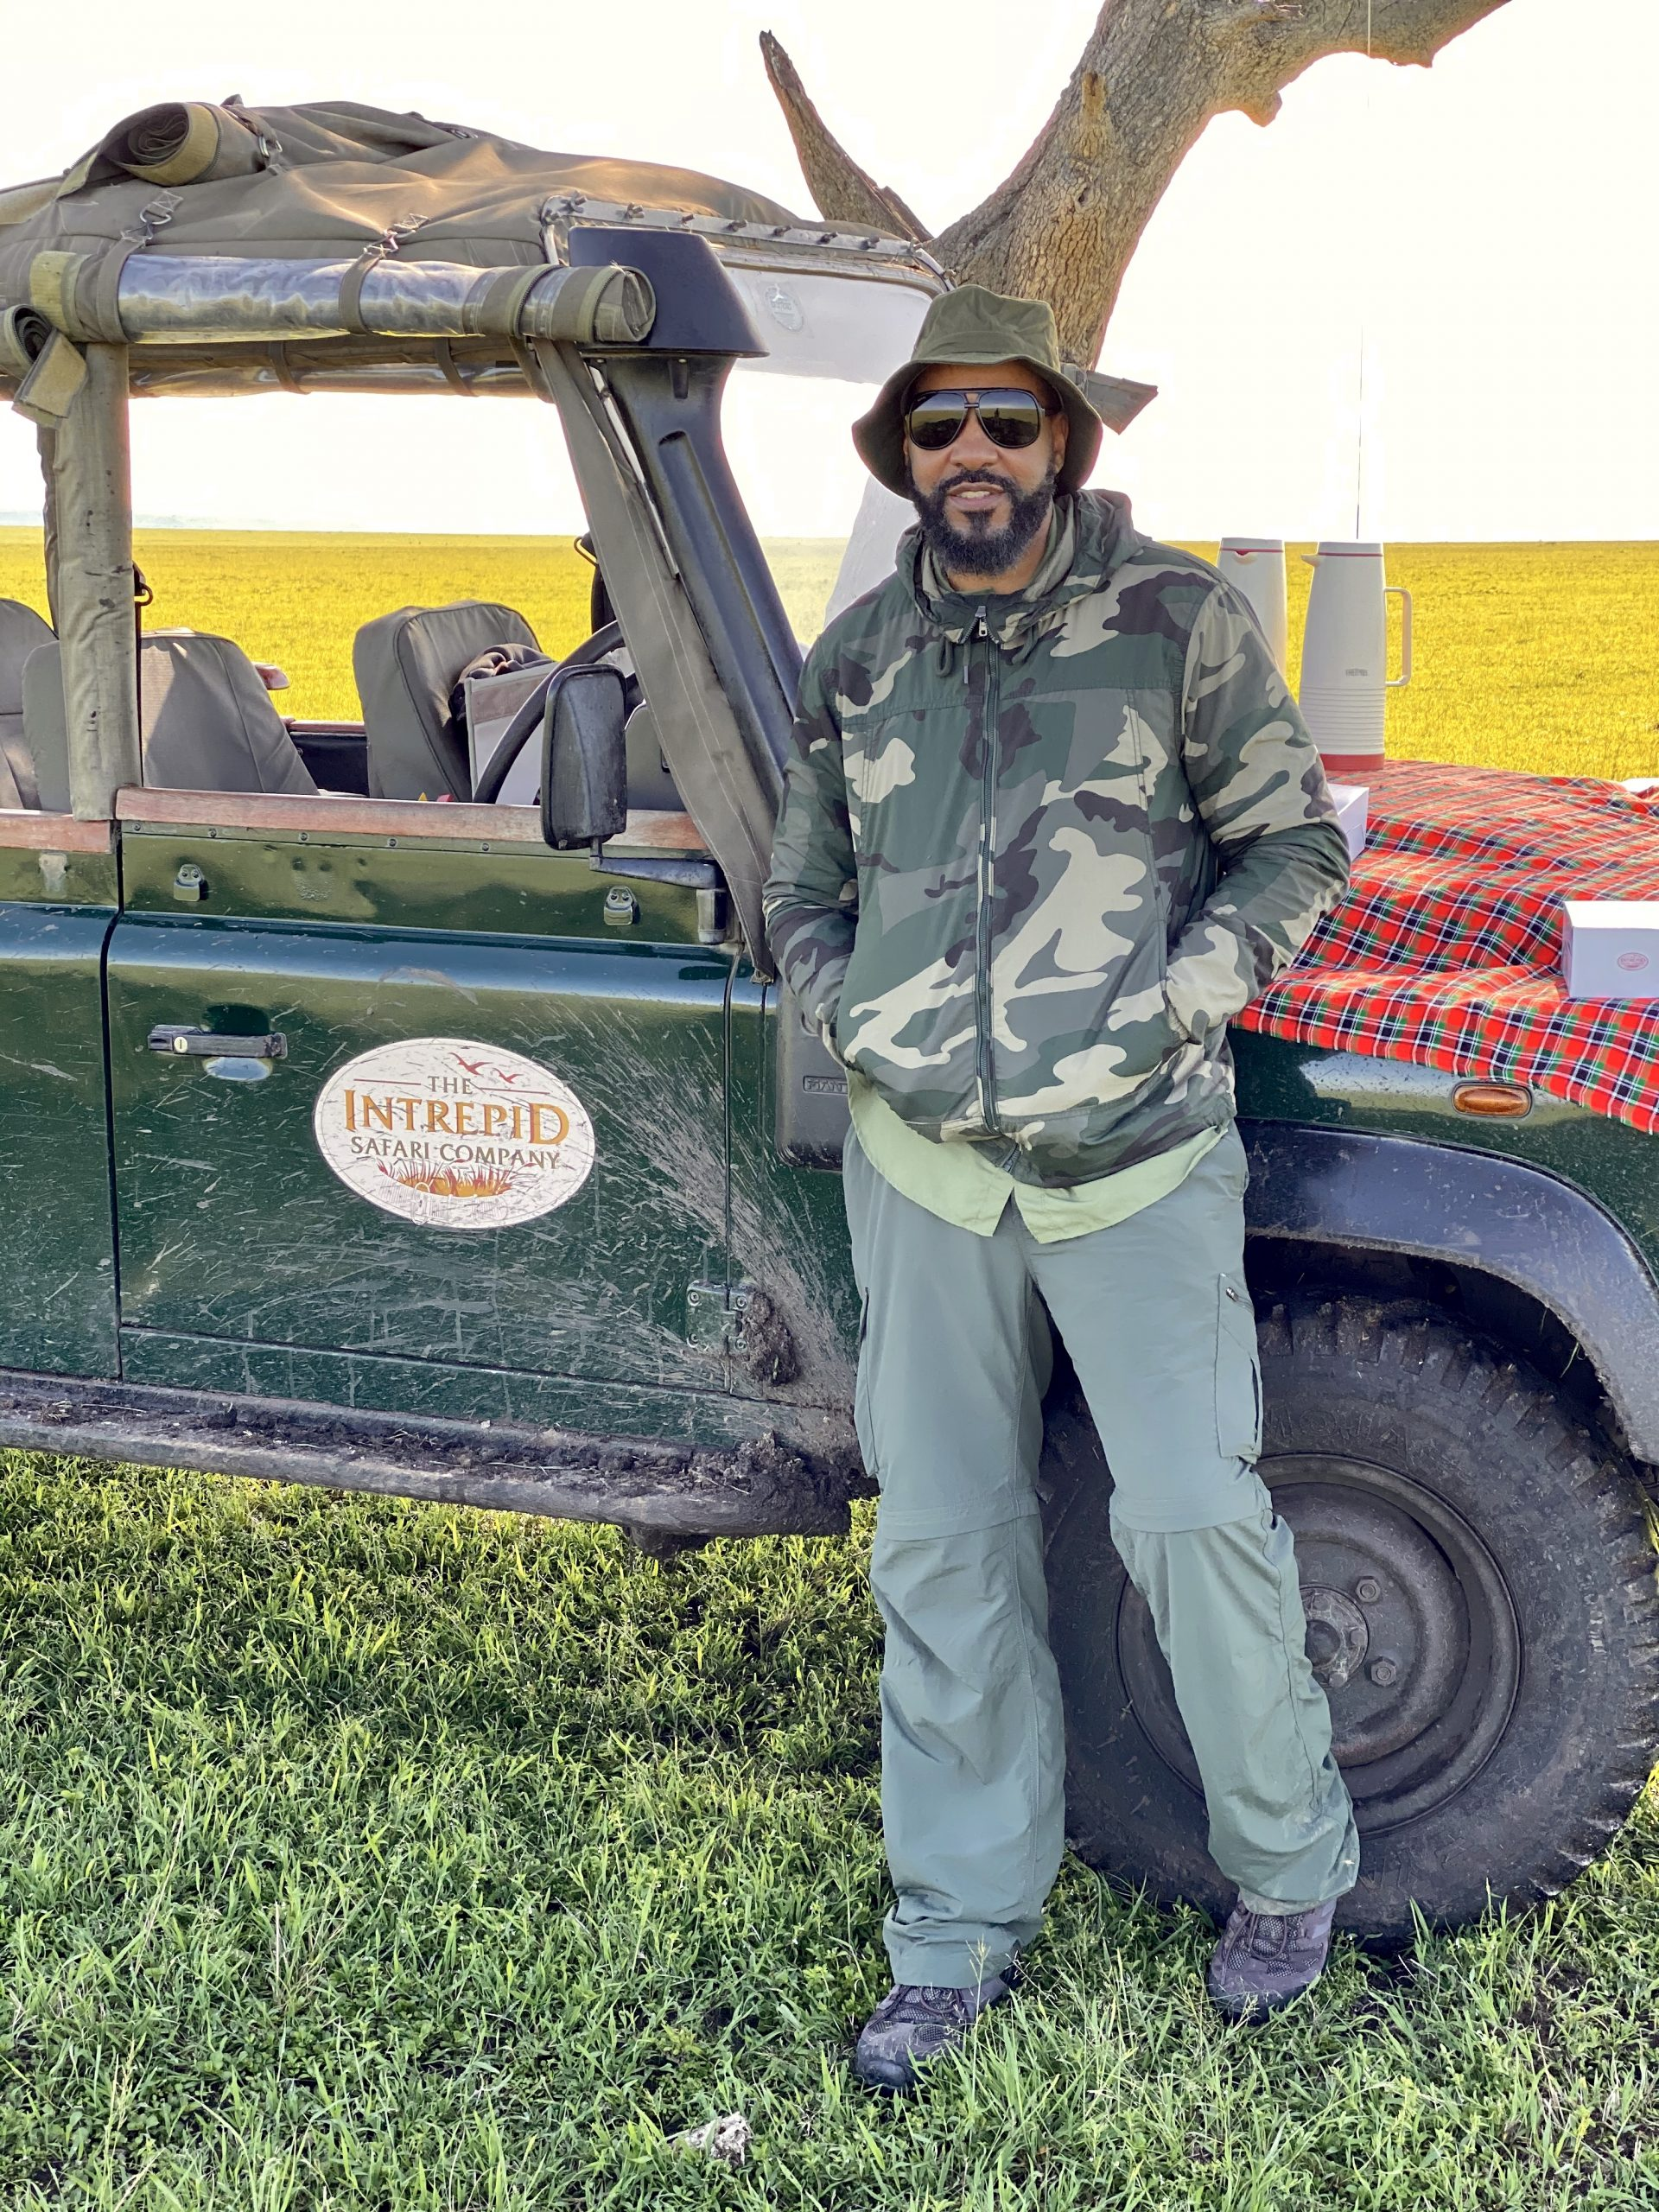 man with cap posing beside muddy jeep